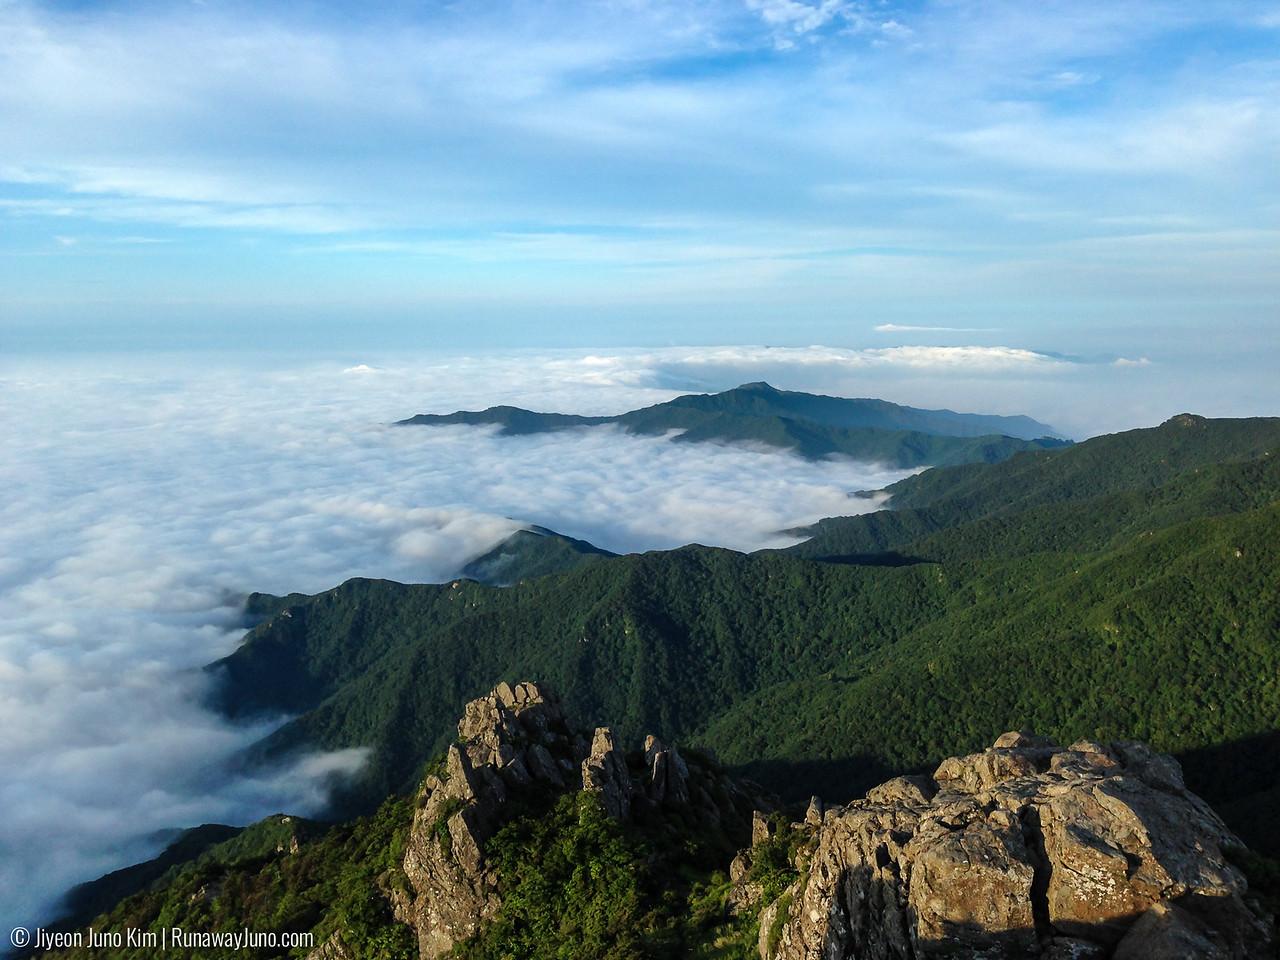 Sea of cloud from Cheonwangbong Peak